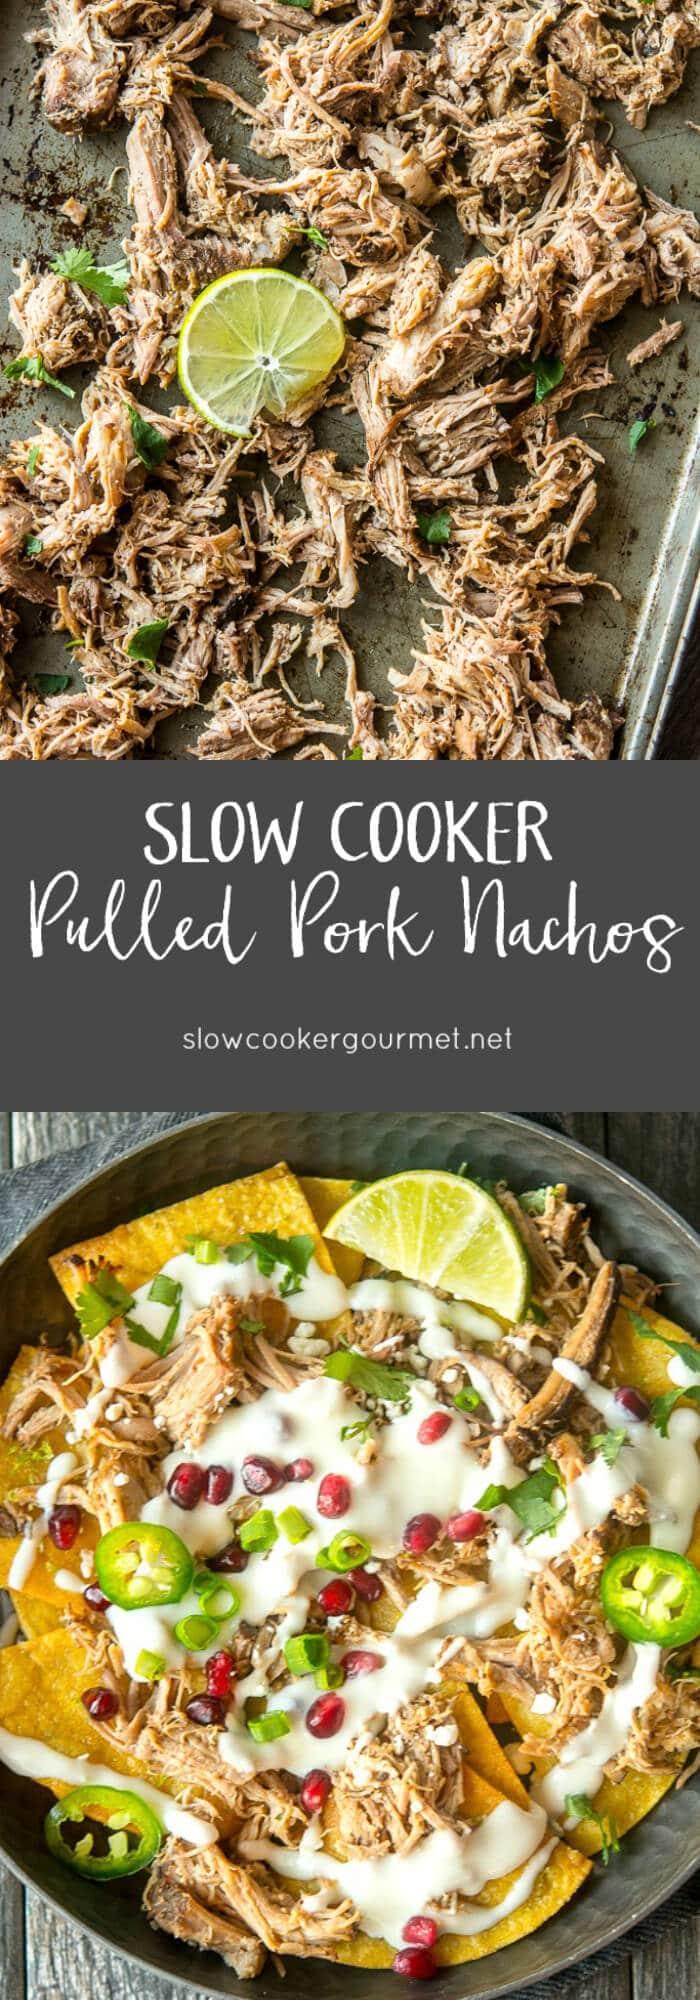 Slow Cooker Pulled Pork Nachos